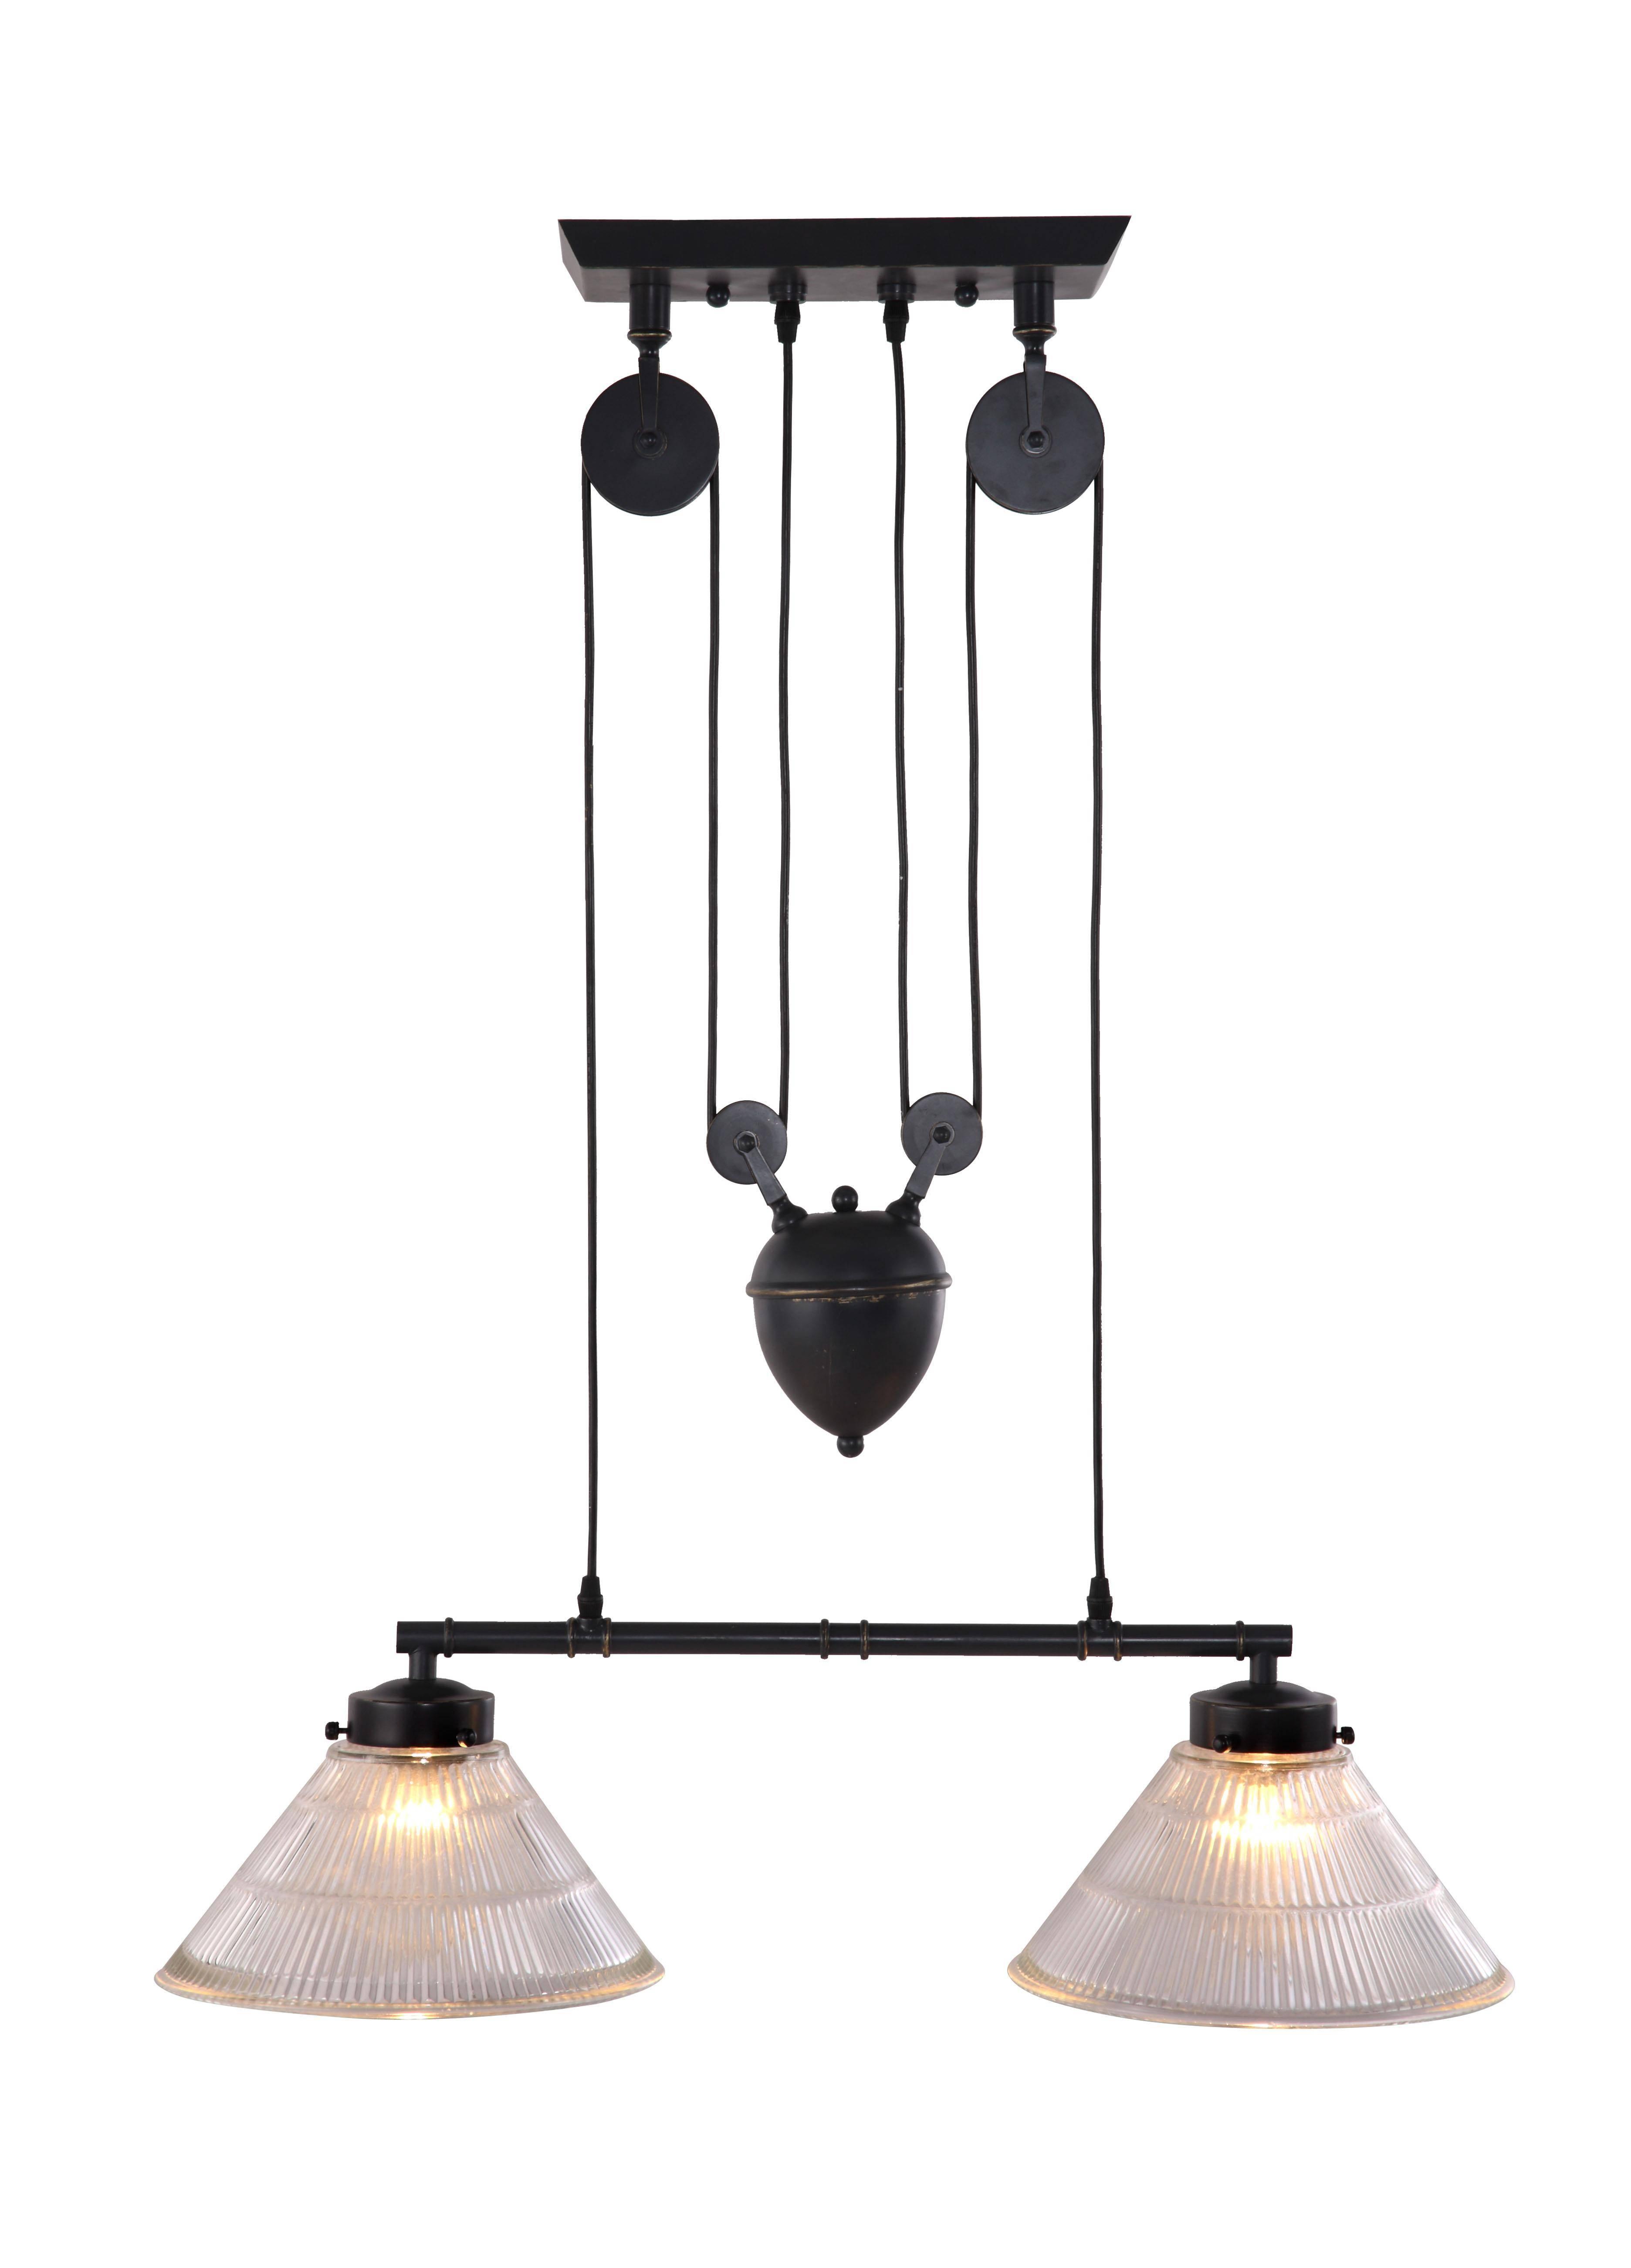 Pendant Lighting : Killer Industrial Double Pendant Light for Cb2 Pendant Lights (Image 11 of 15)